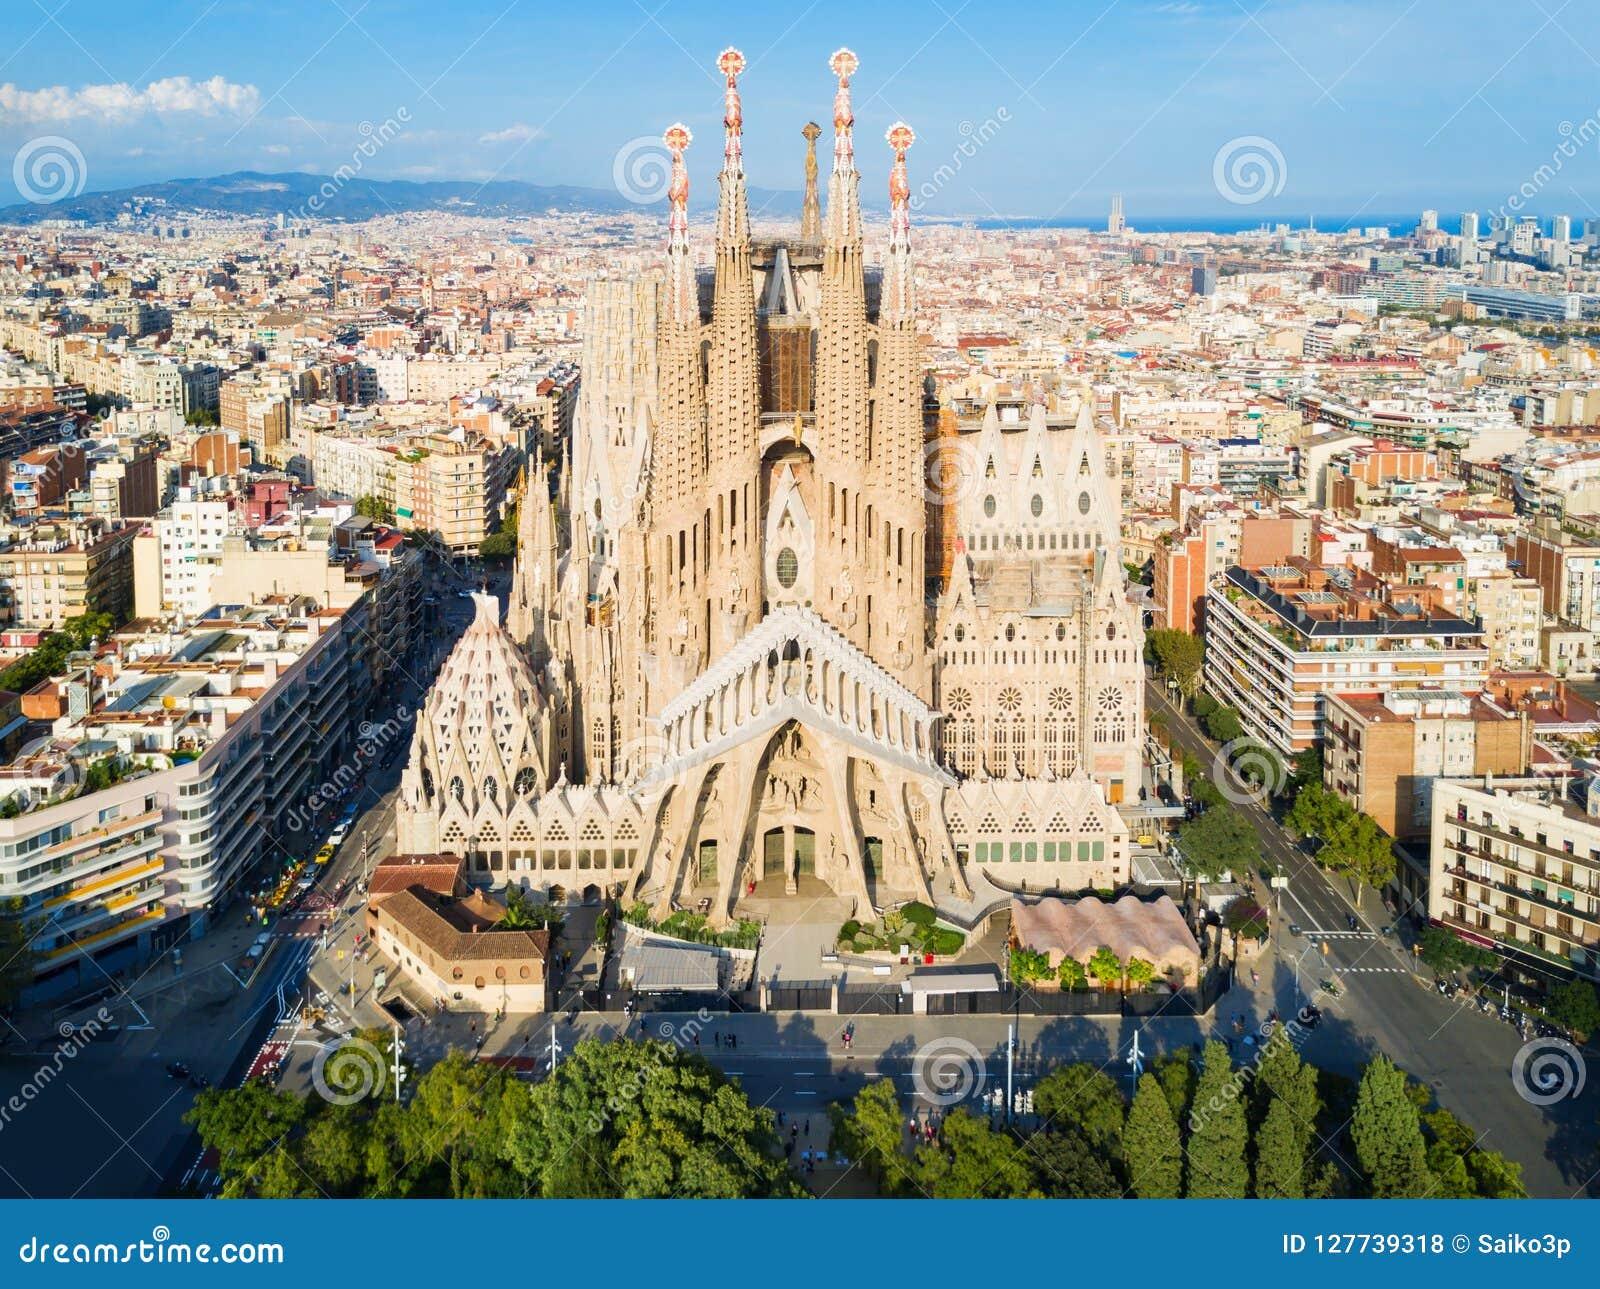 Sagrada Familia Aerial View Barcelona Editorial Stock Photo Image